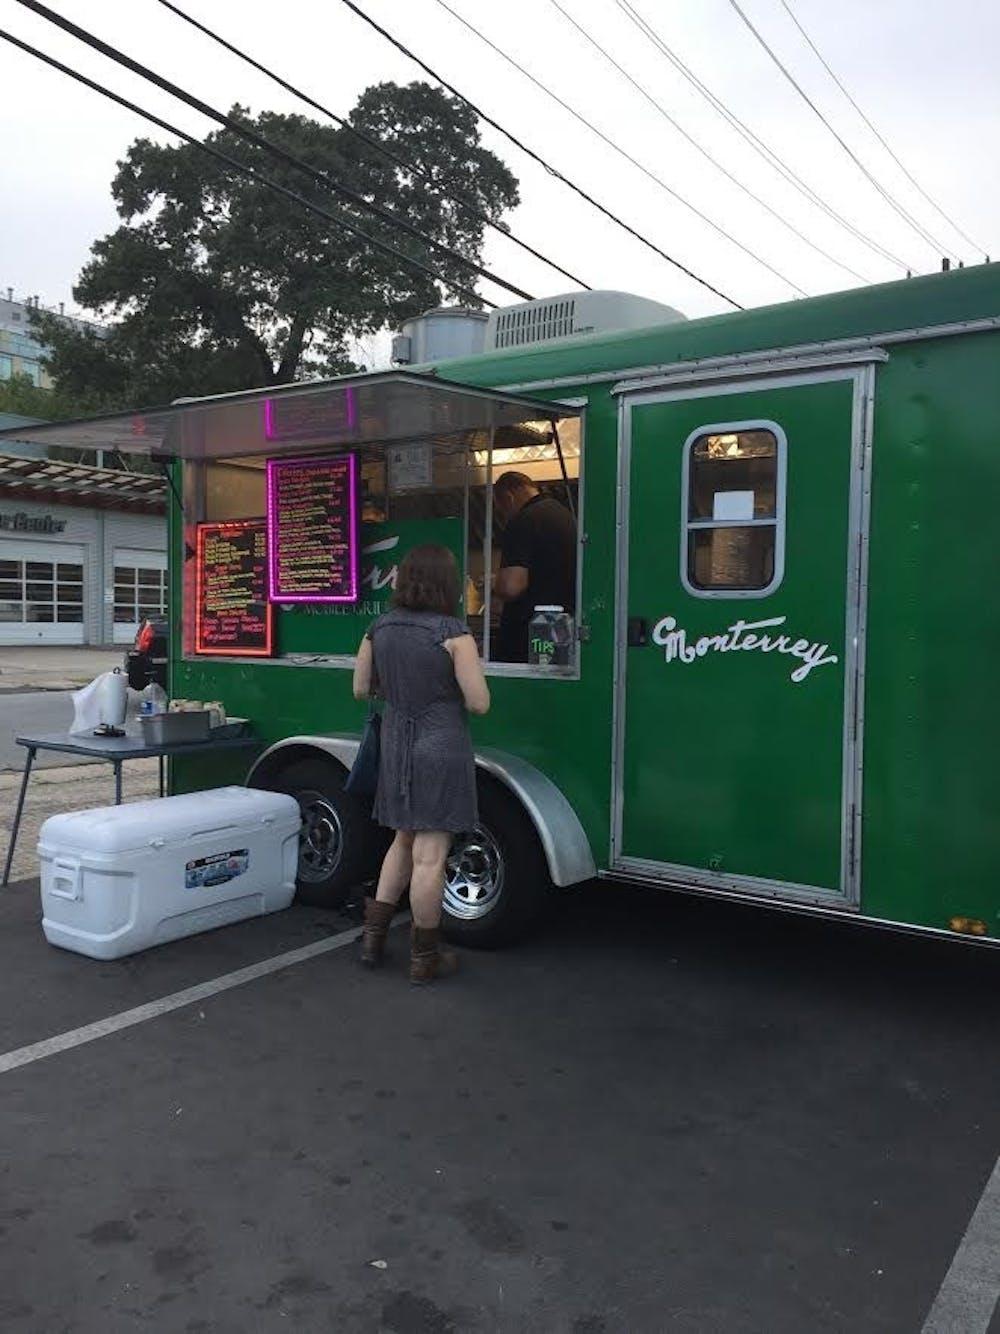 <p>The Monterrey Mexican food truck parks around town.&nbsp;</p>